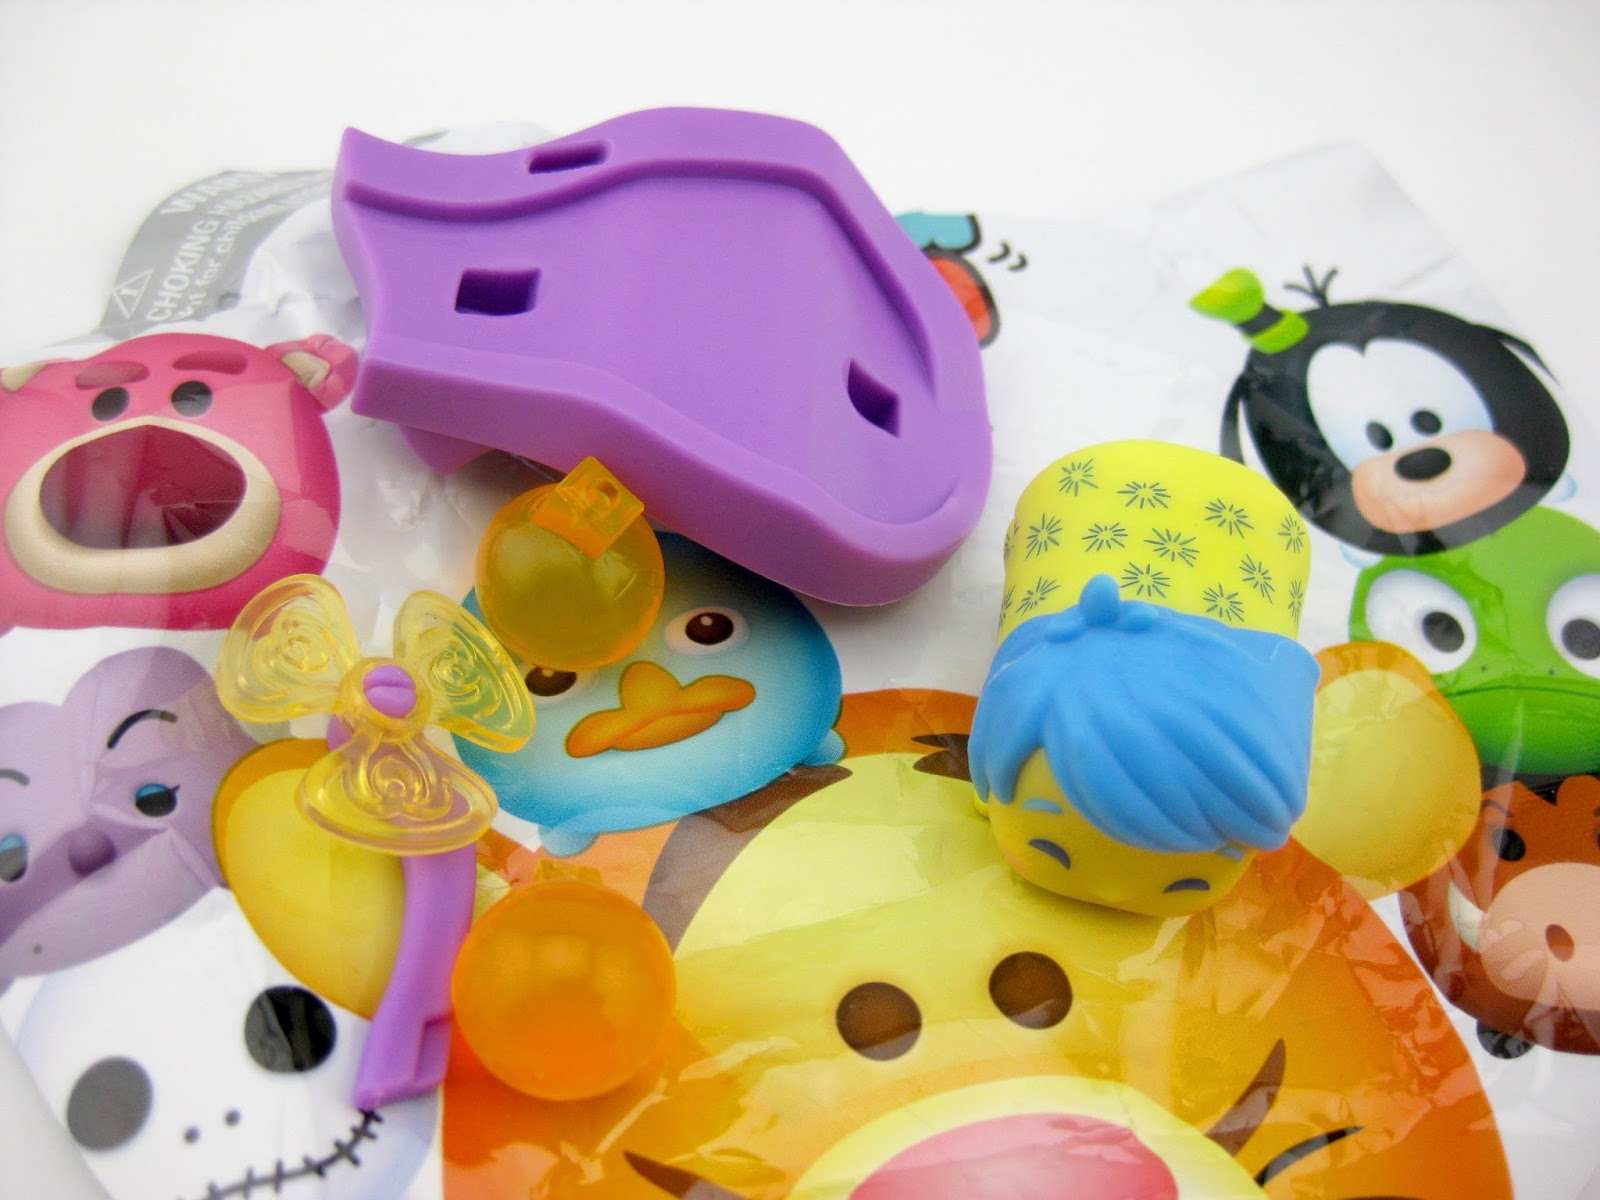 Disney Tsum Tsum Mystery Stack Packs Jakks Pacific Series 4 joy